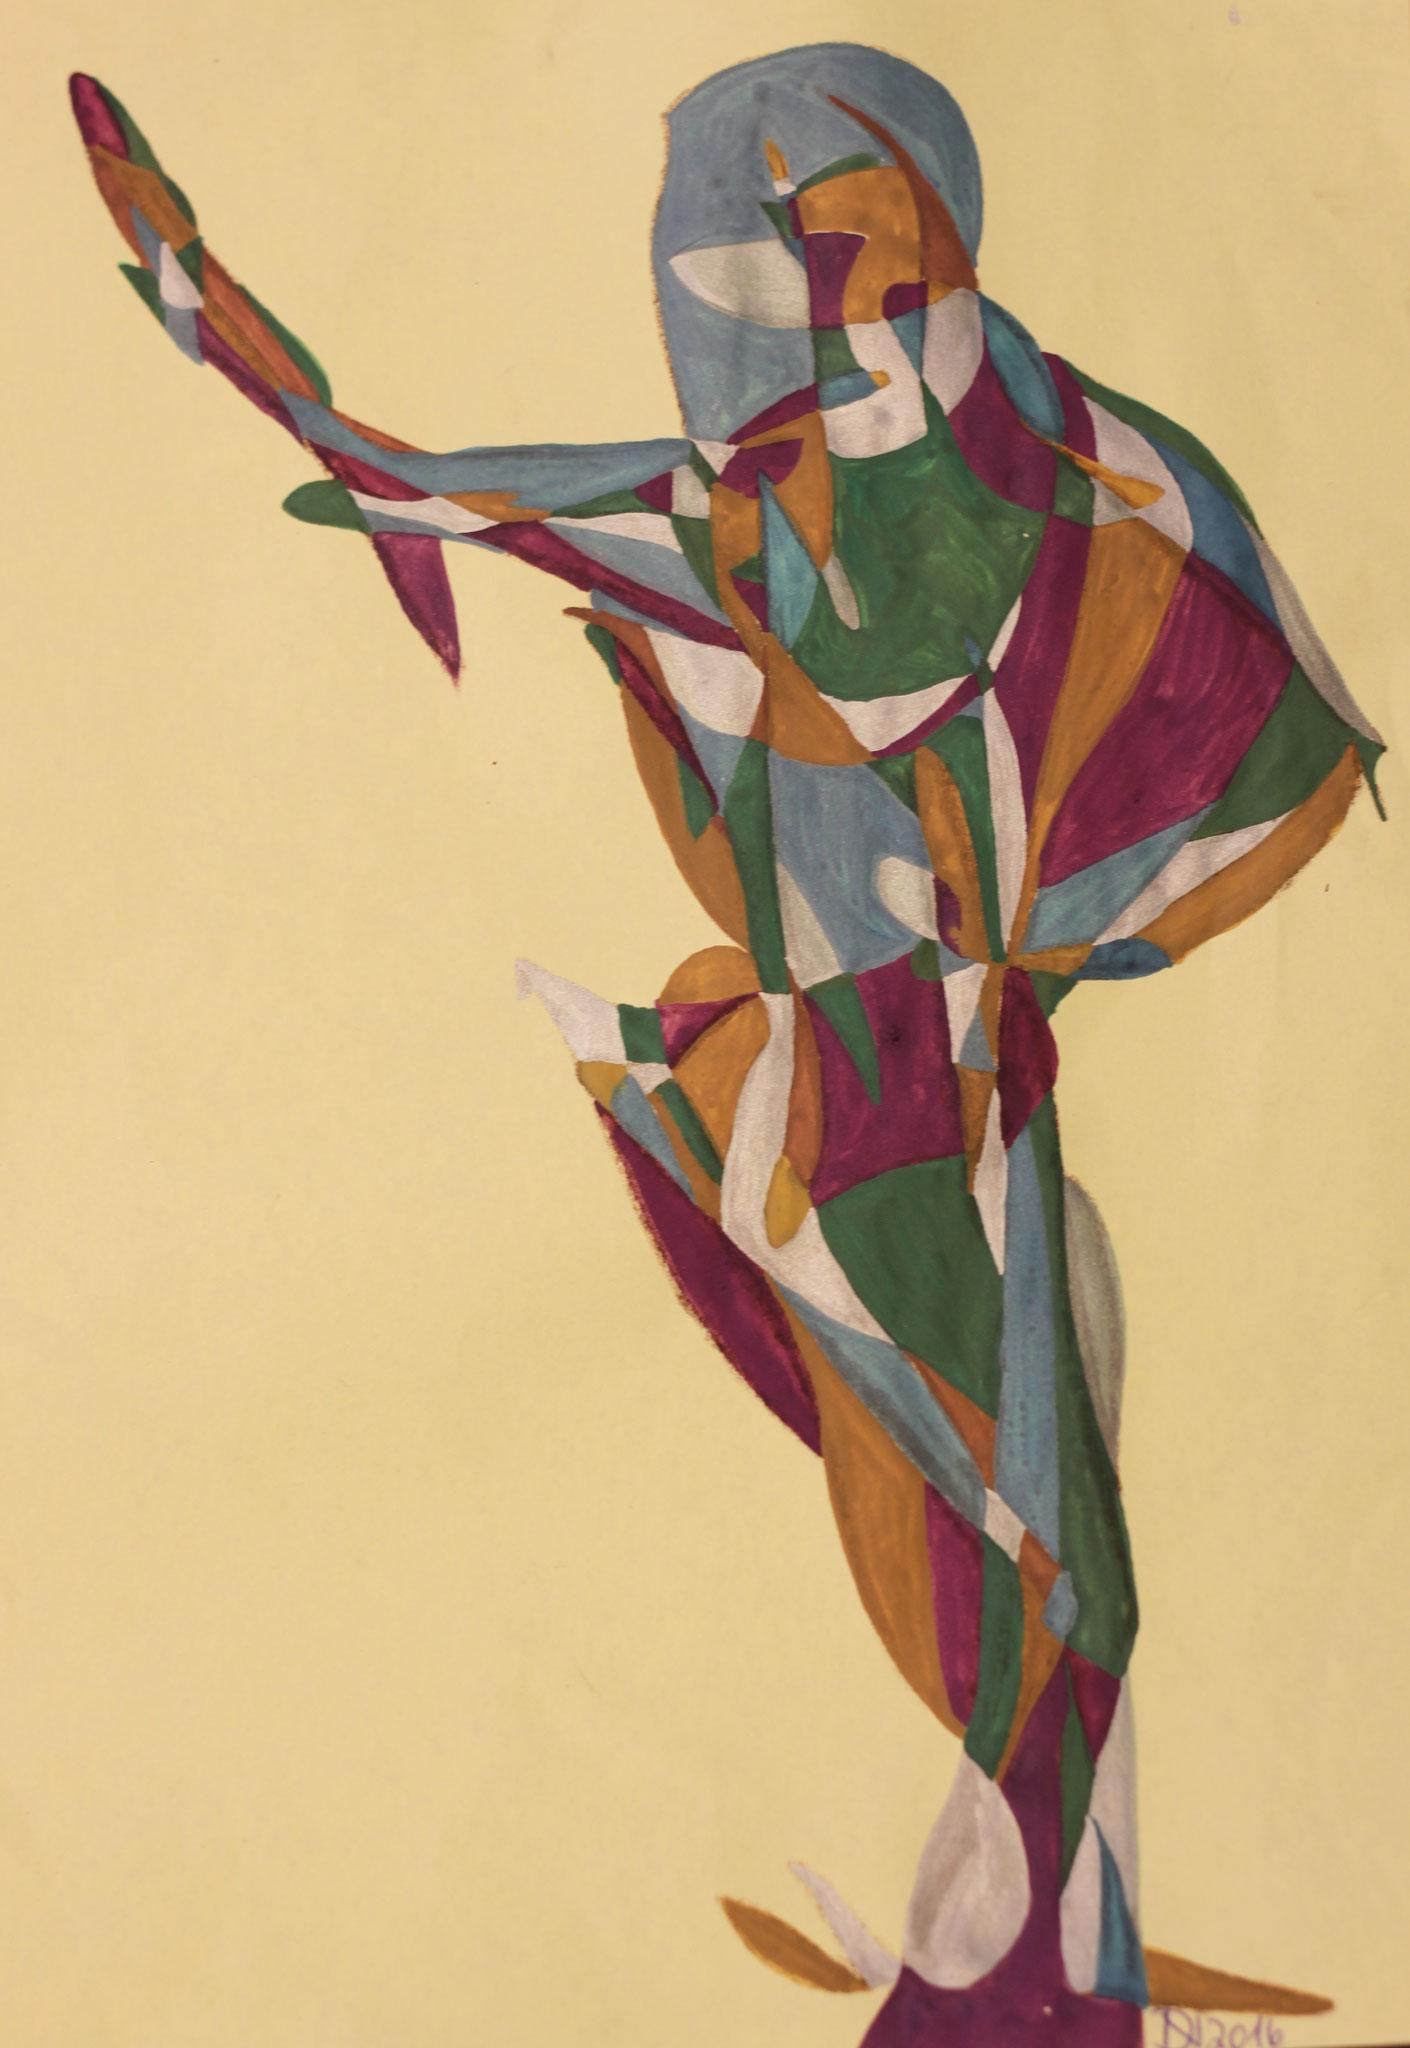 Olympia, Aquarell und Buntstift auf Papier, 2017, 29 x 21 cm